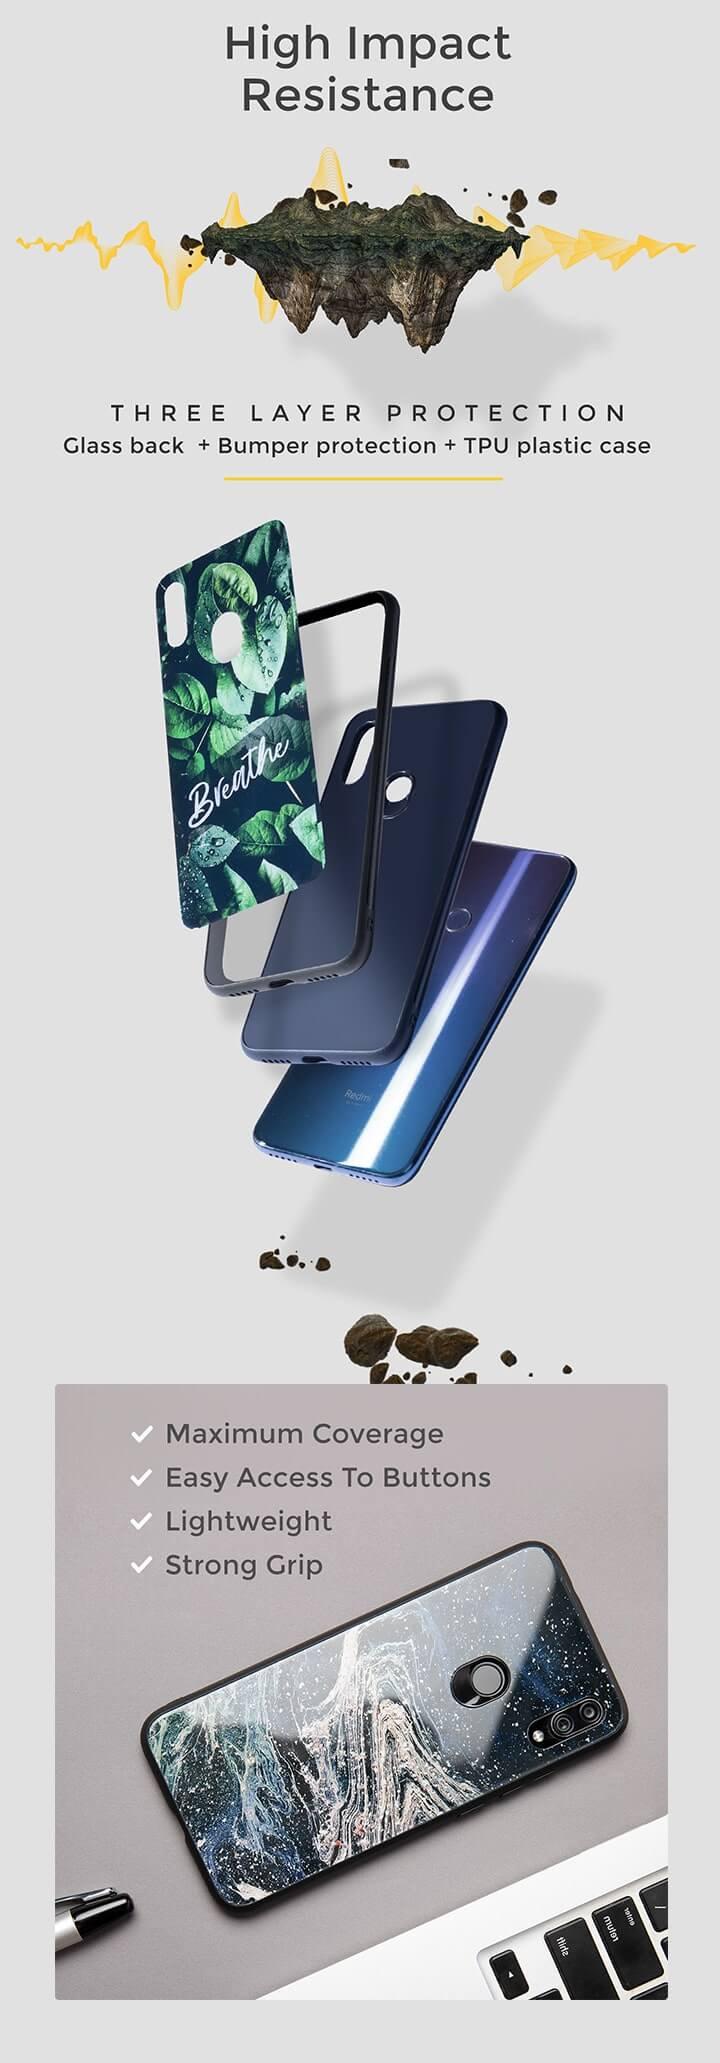 Thor Hammer Vivo V15 Pro Glass Mobile Cover (AVL) Description Image Mobile Site 1@Bewakoof.com